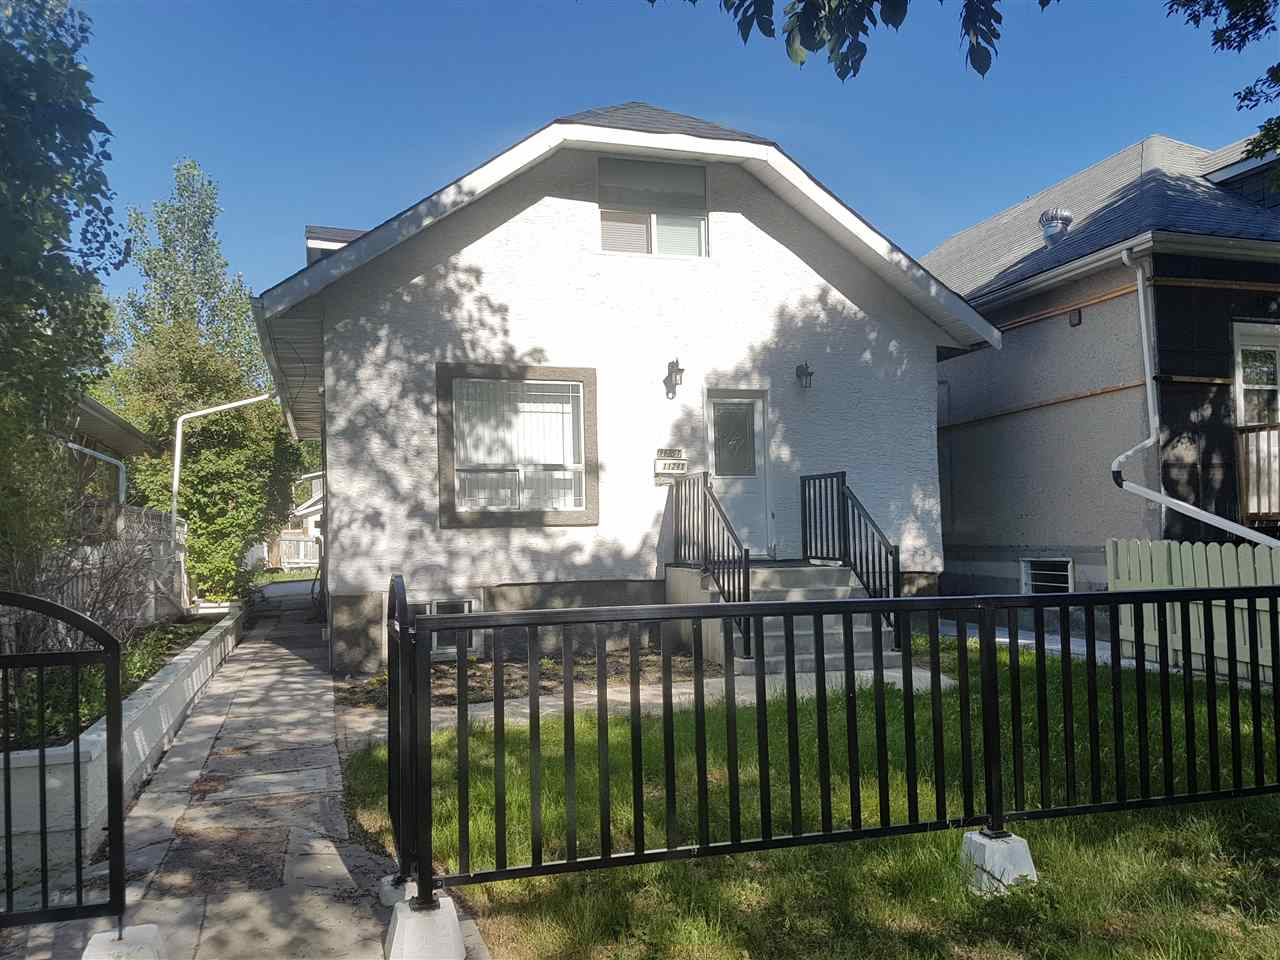 11241 96 Street, 4 bed, 3 bath, at $279,900